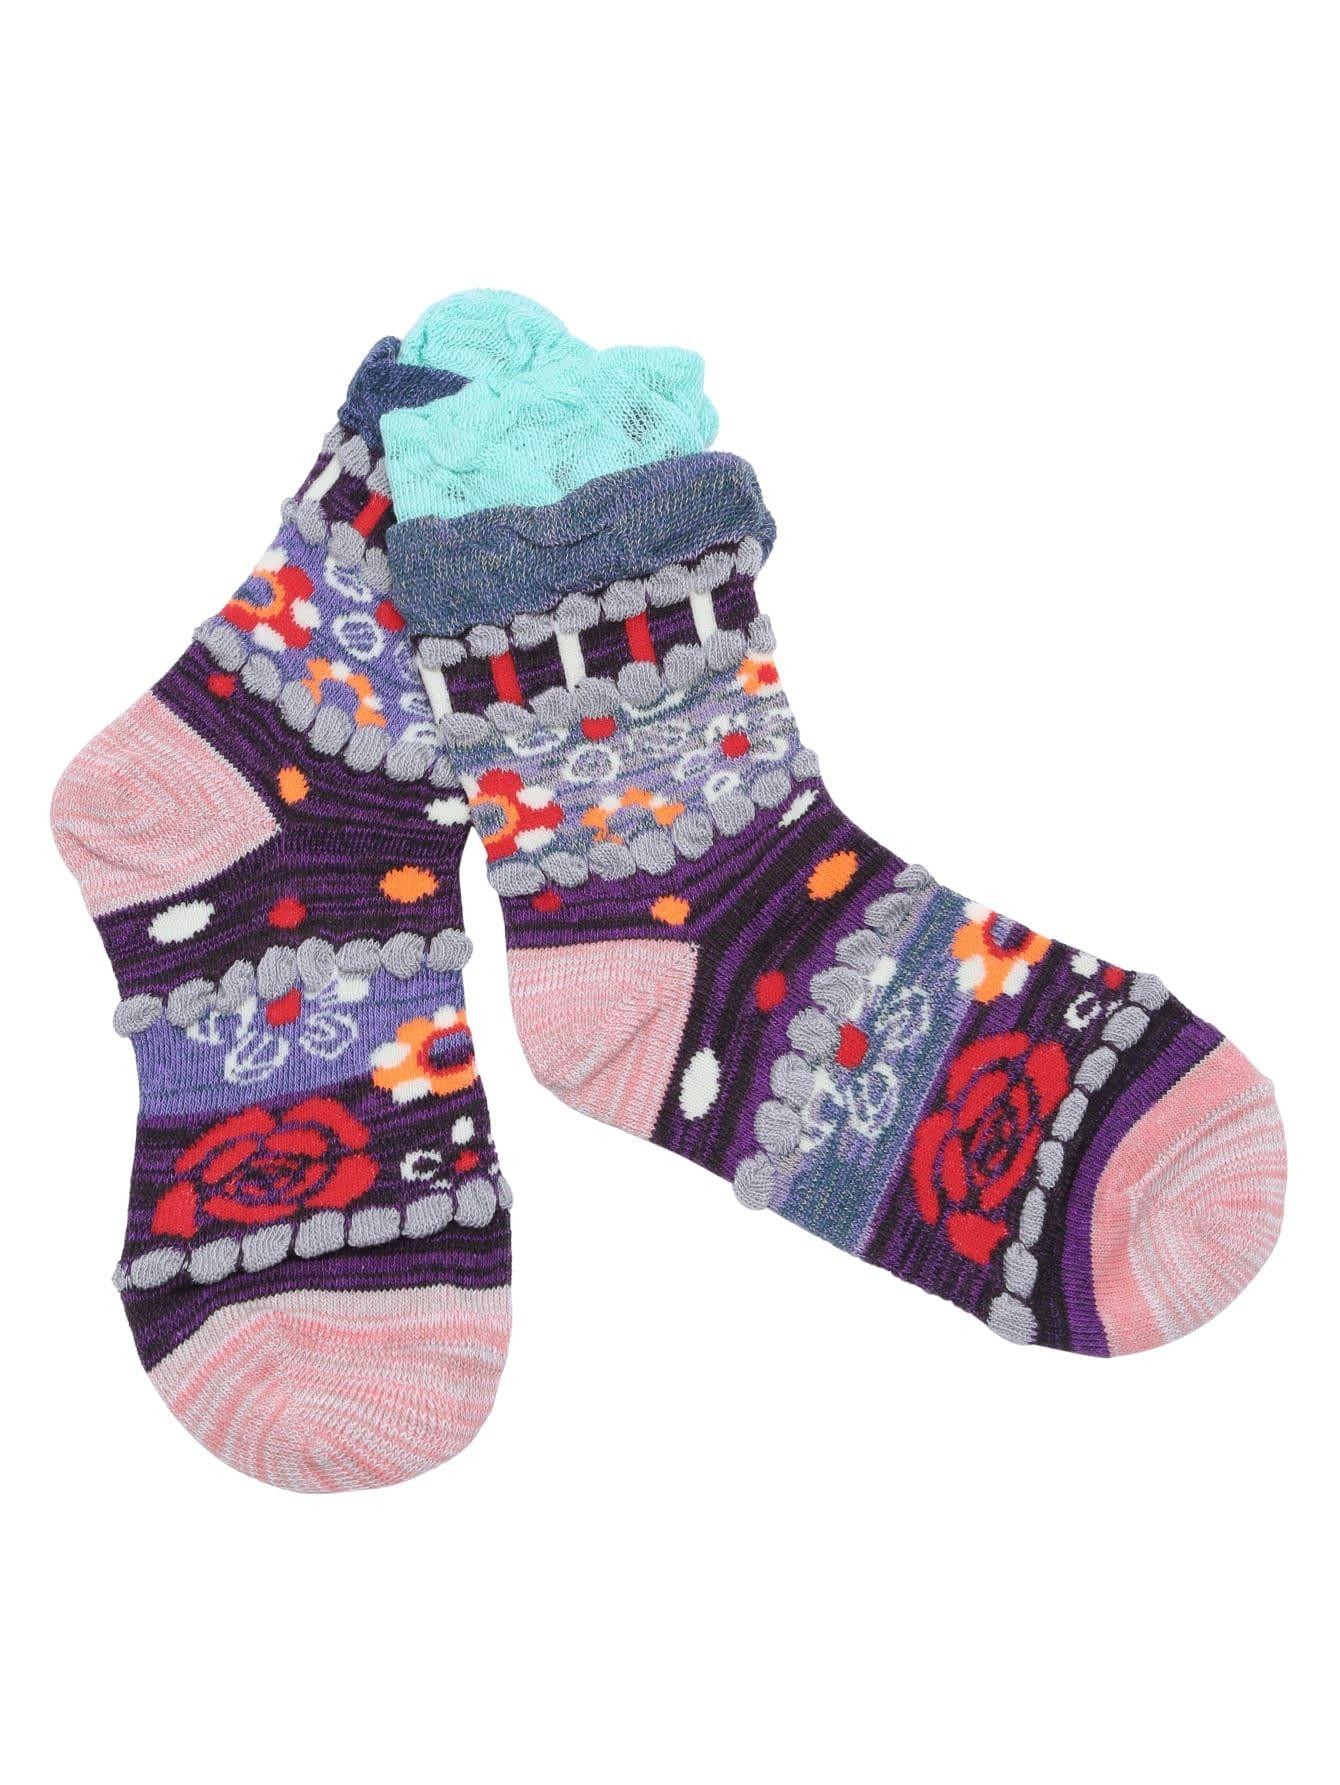 Multicolor National Style Rib Cuff Socks sock161025307